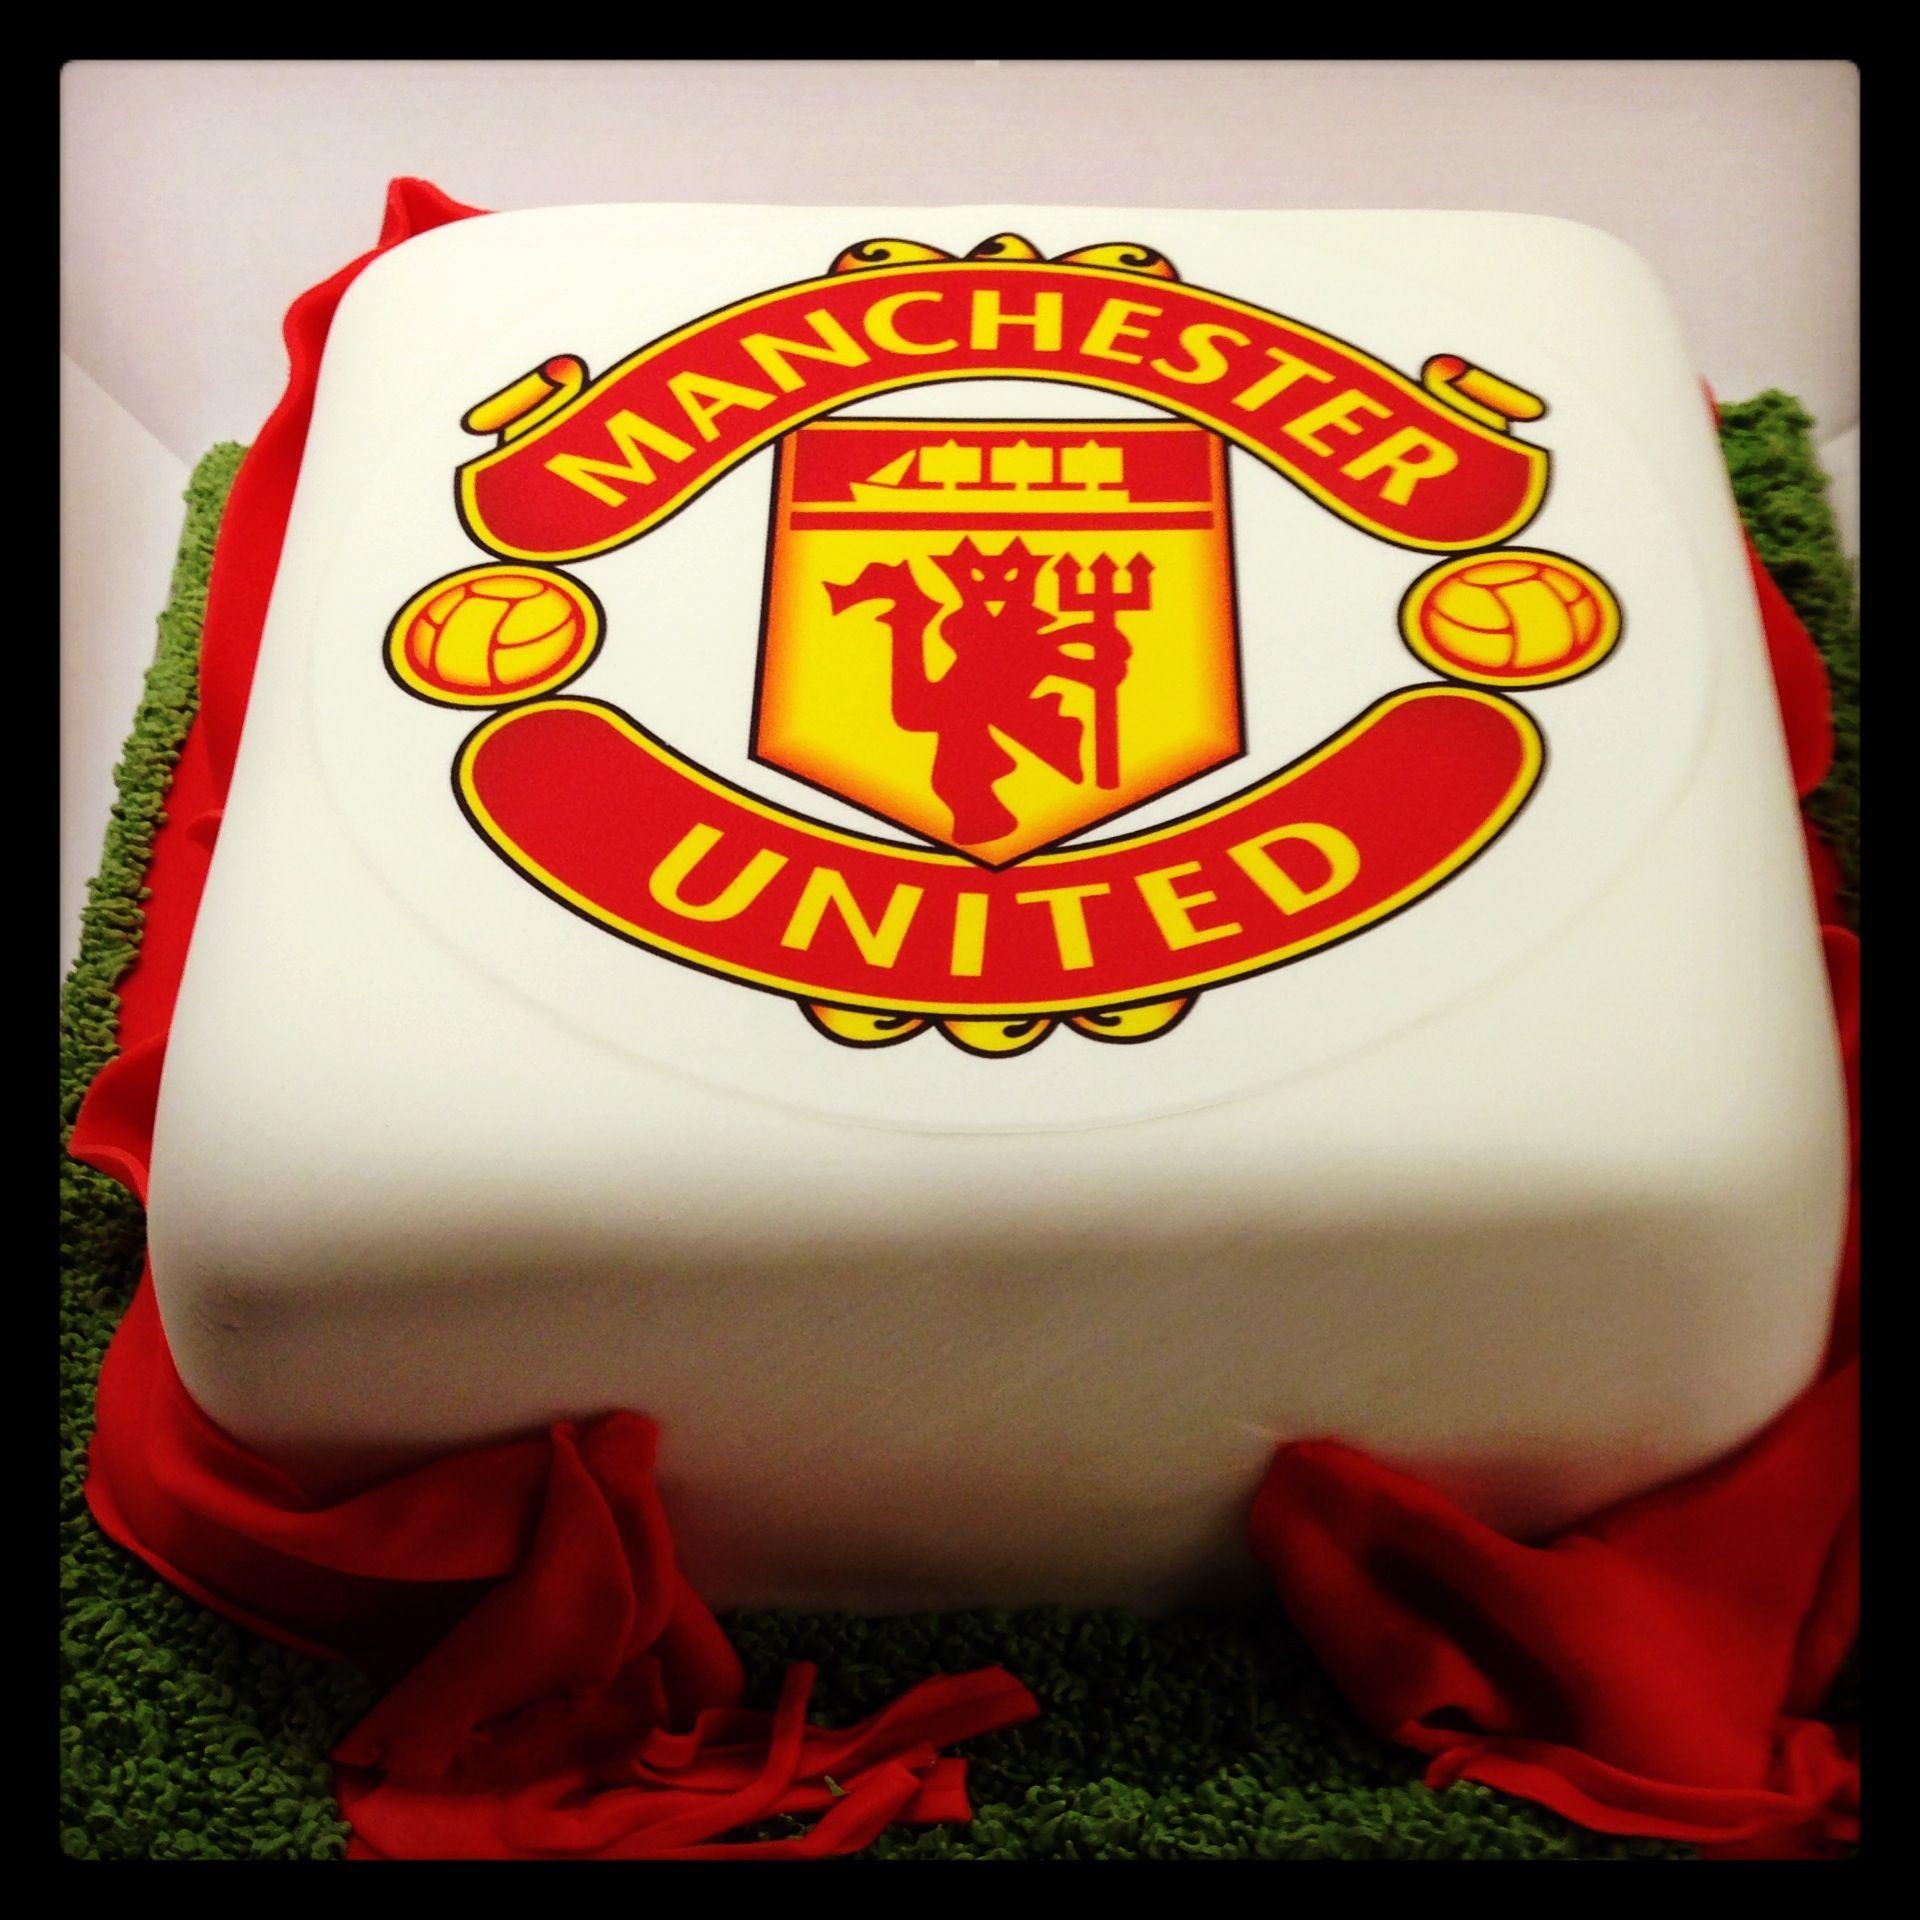 Manchester United Cake. 100% Edible. Vanilla Sponge